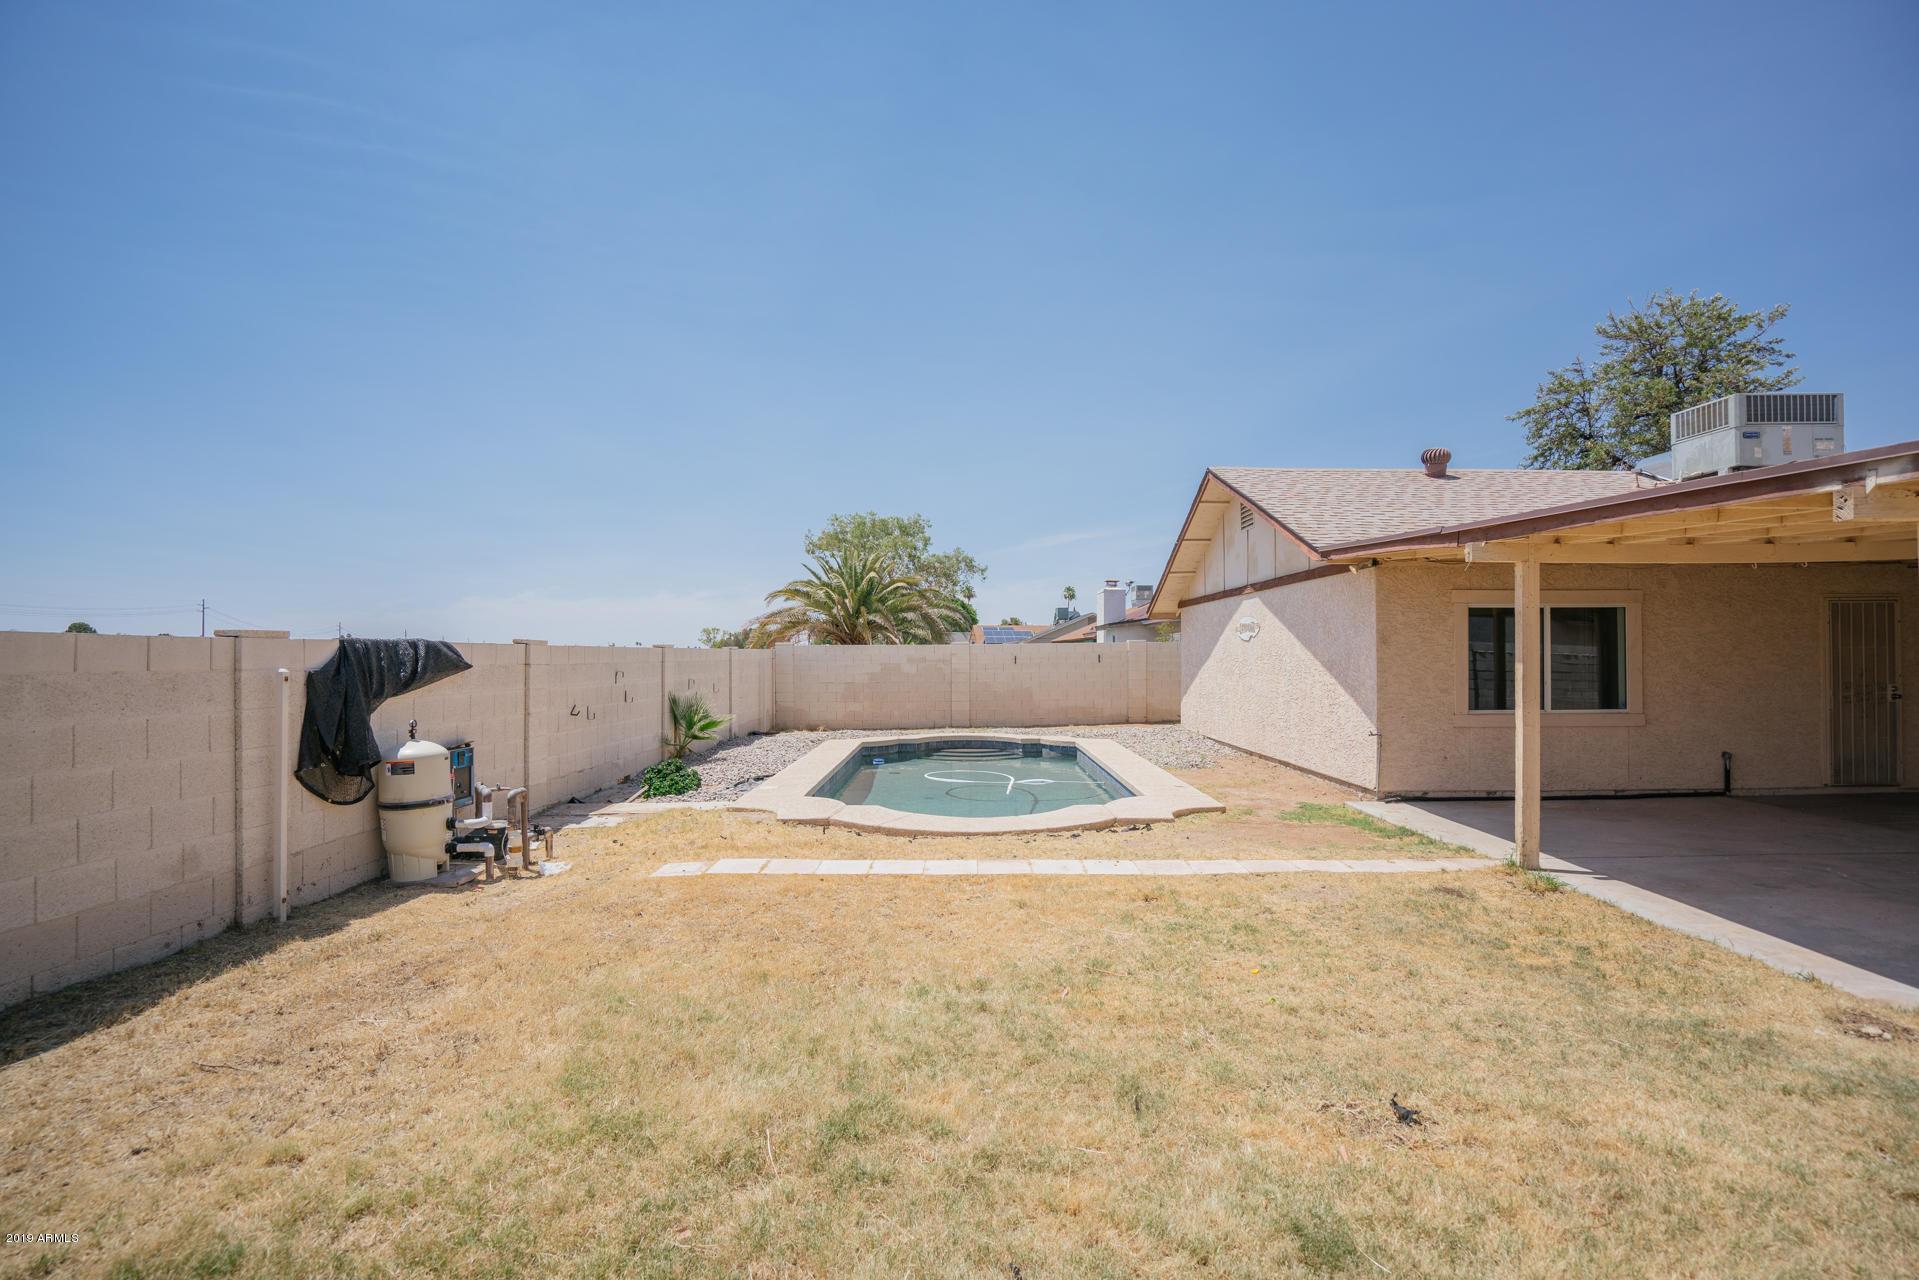 MLS 5941601 6255 W HEARN Road, Glendale, AZ 85306 Glendale AZ North Glendale